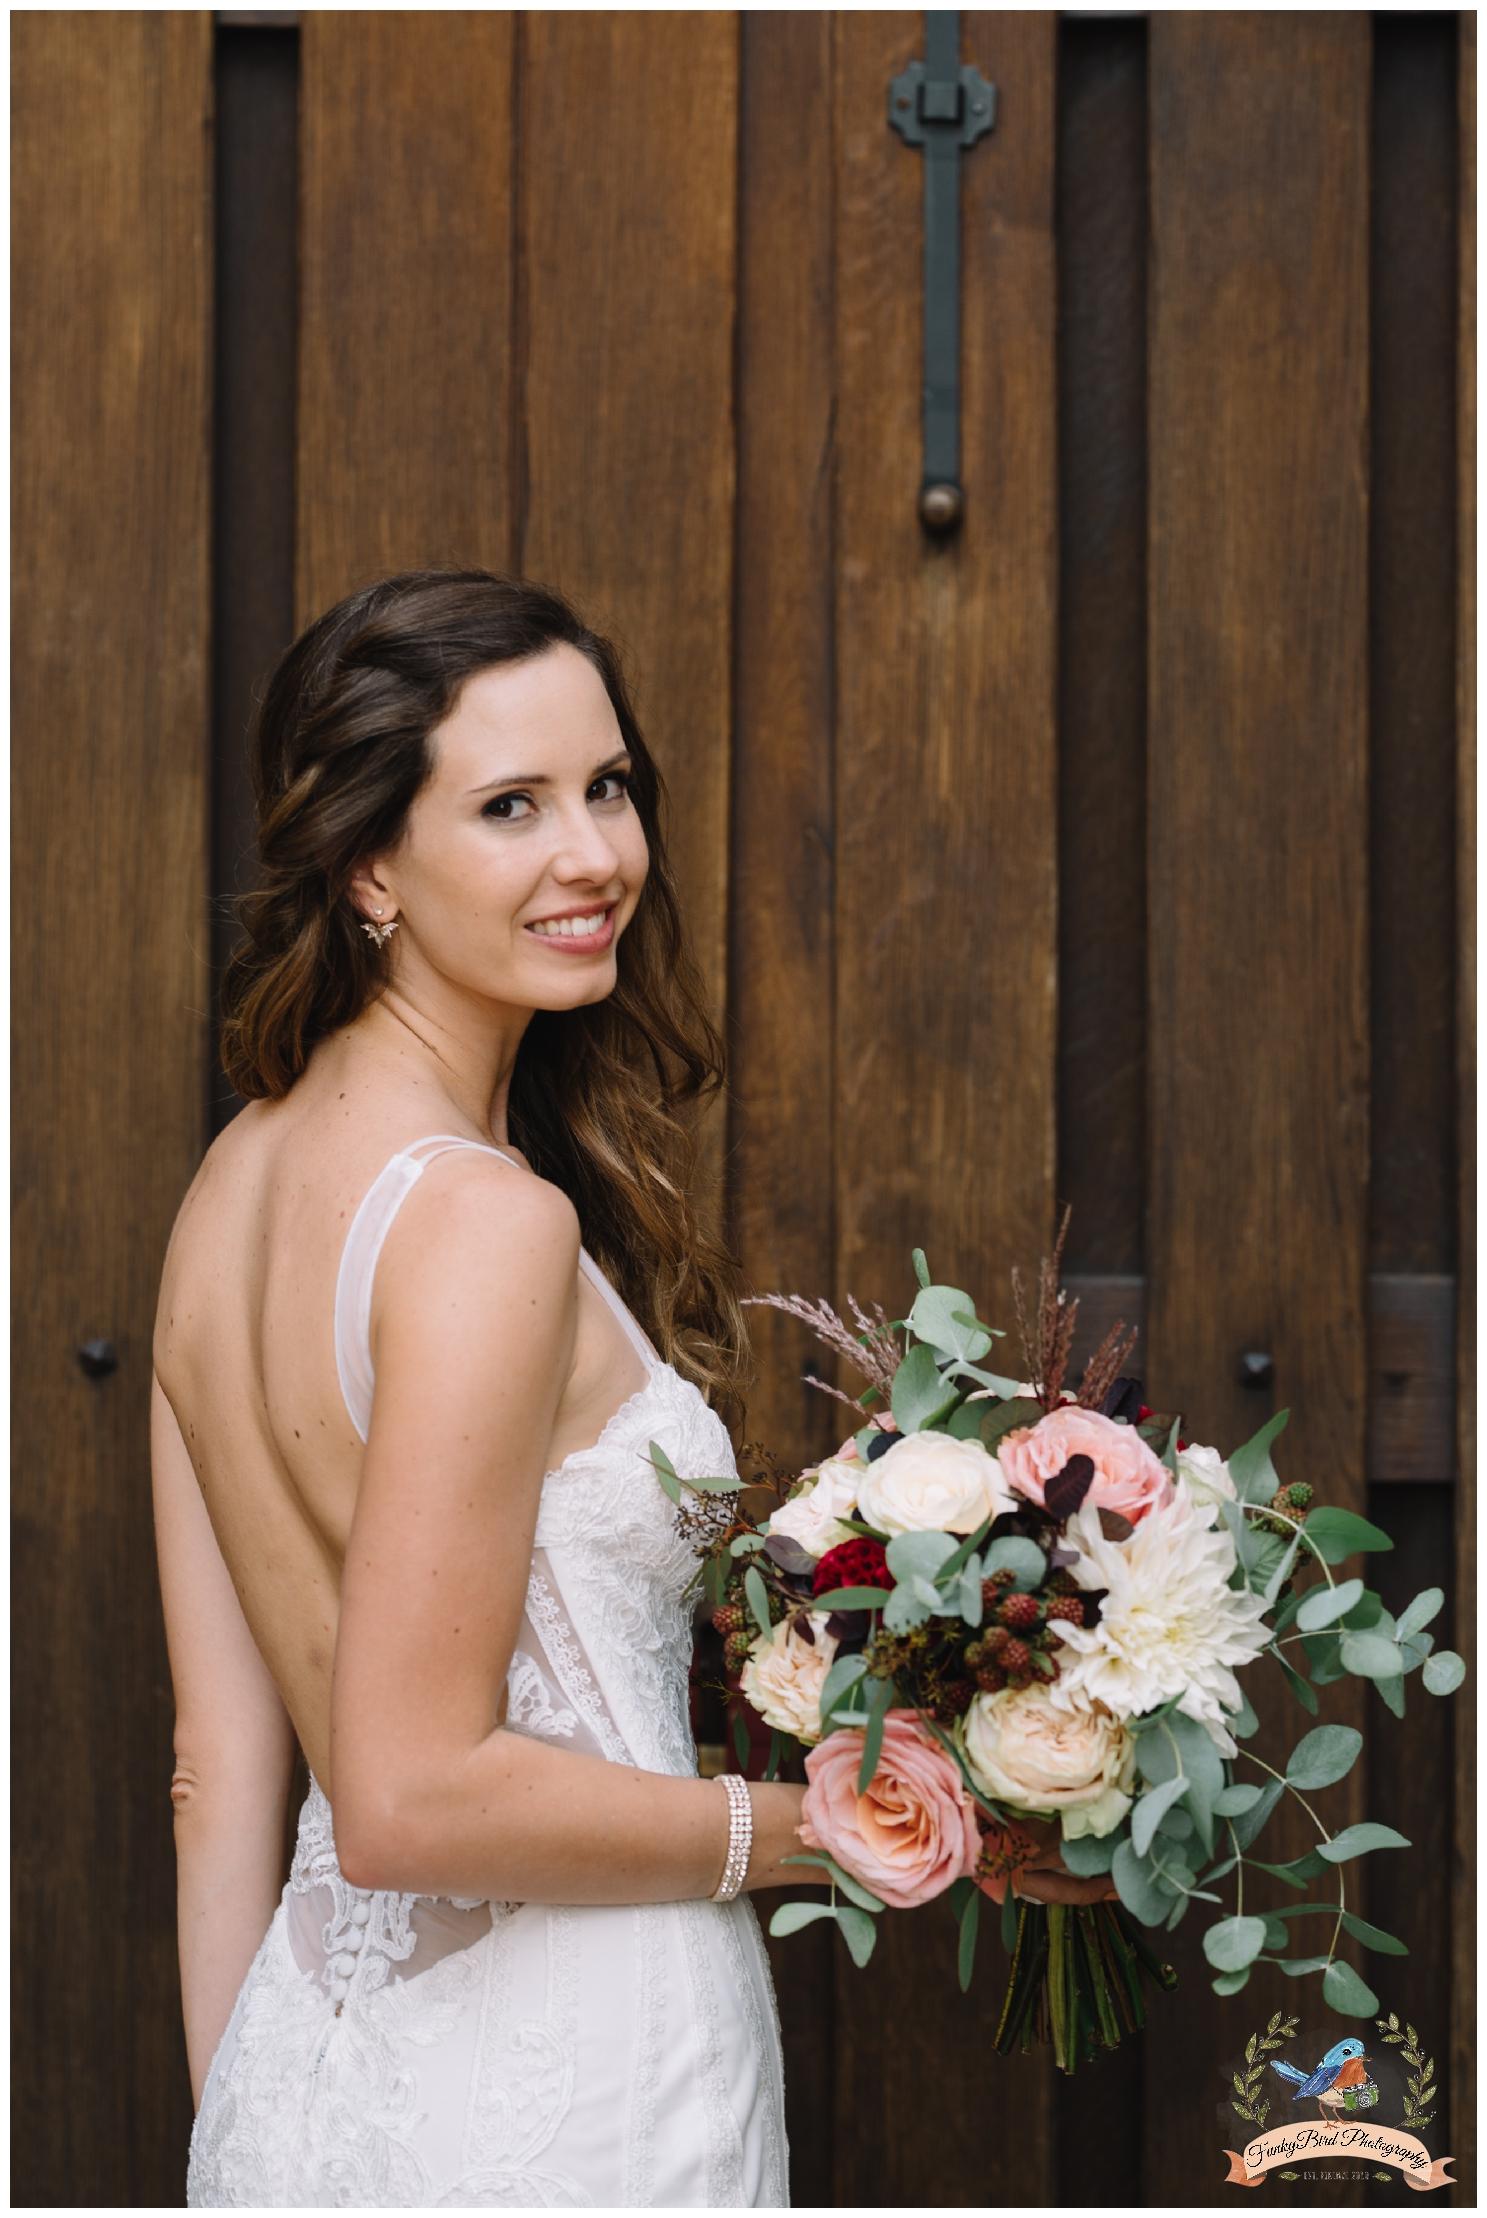 Wedding Photographer in Tuscany, Wedding Photographer in Florence, Wedding Photographer Siena, Italian Wedding Photographer, Wedding in Tuscany, Wedding in Florence, Wedding in Italy